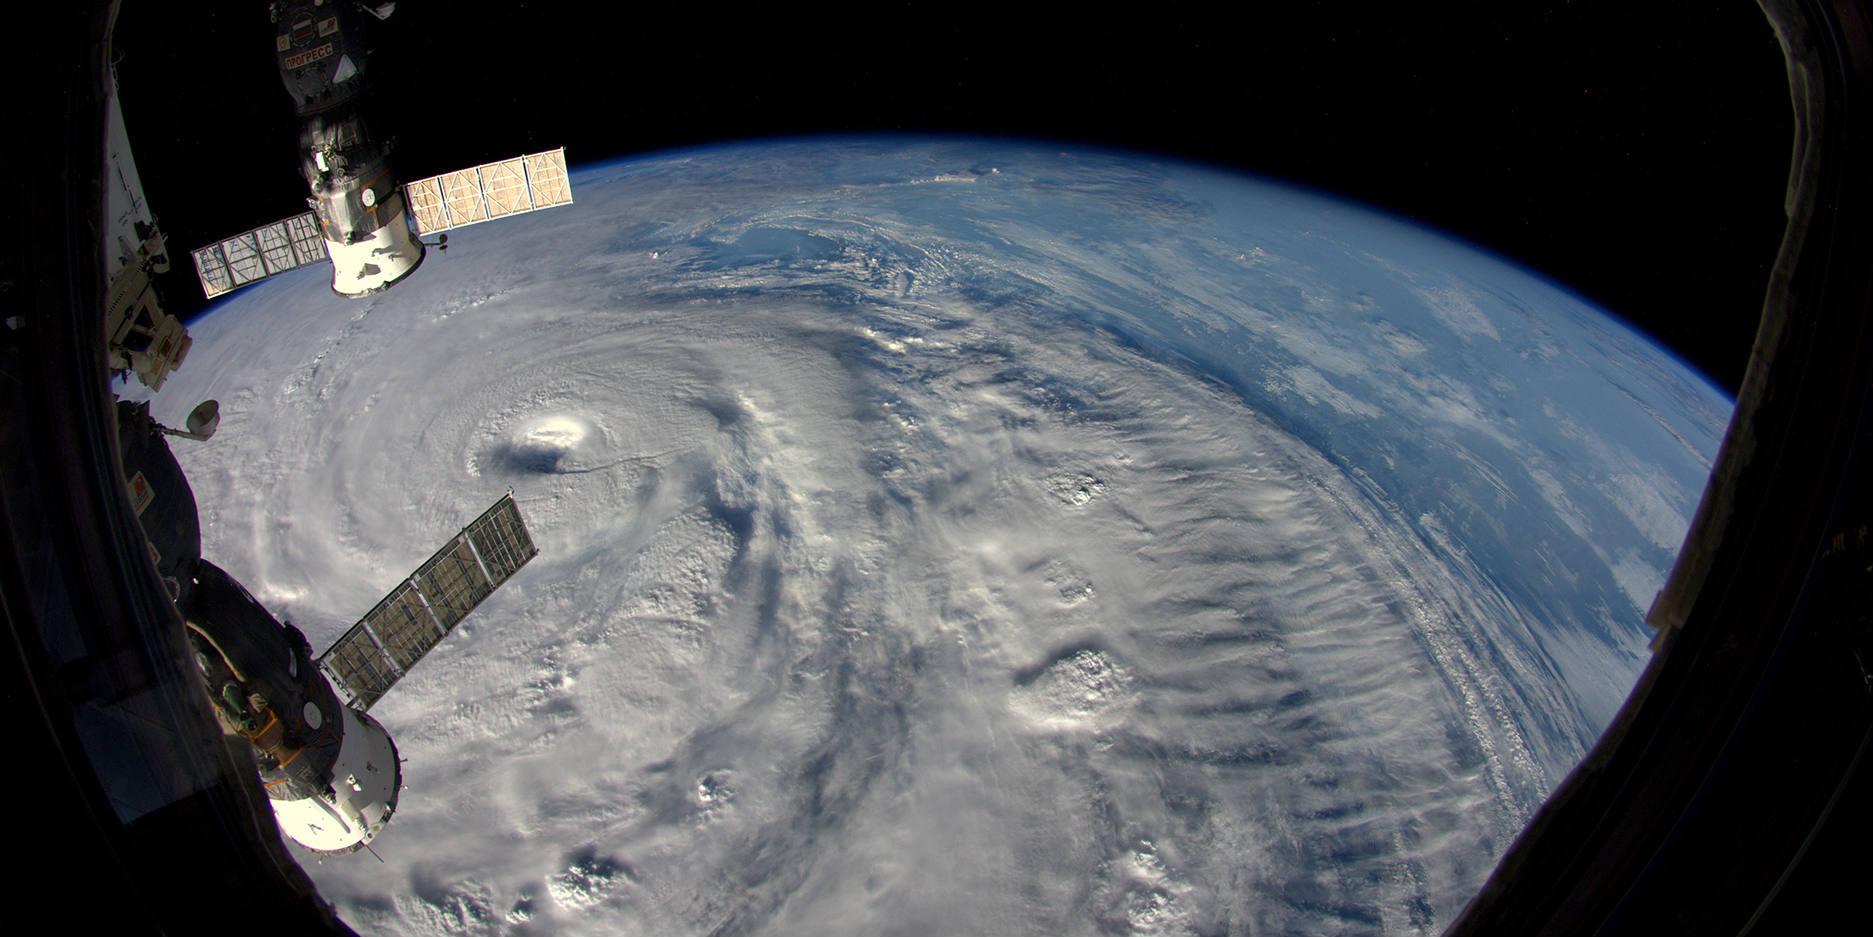 ESA - Eye of the storm